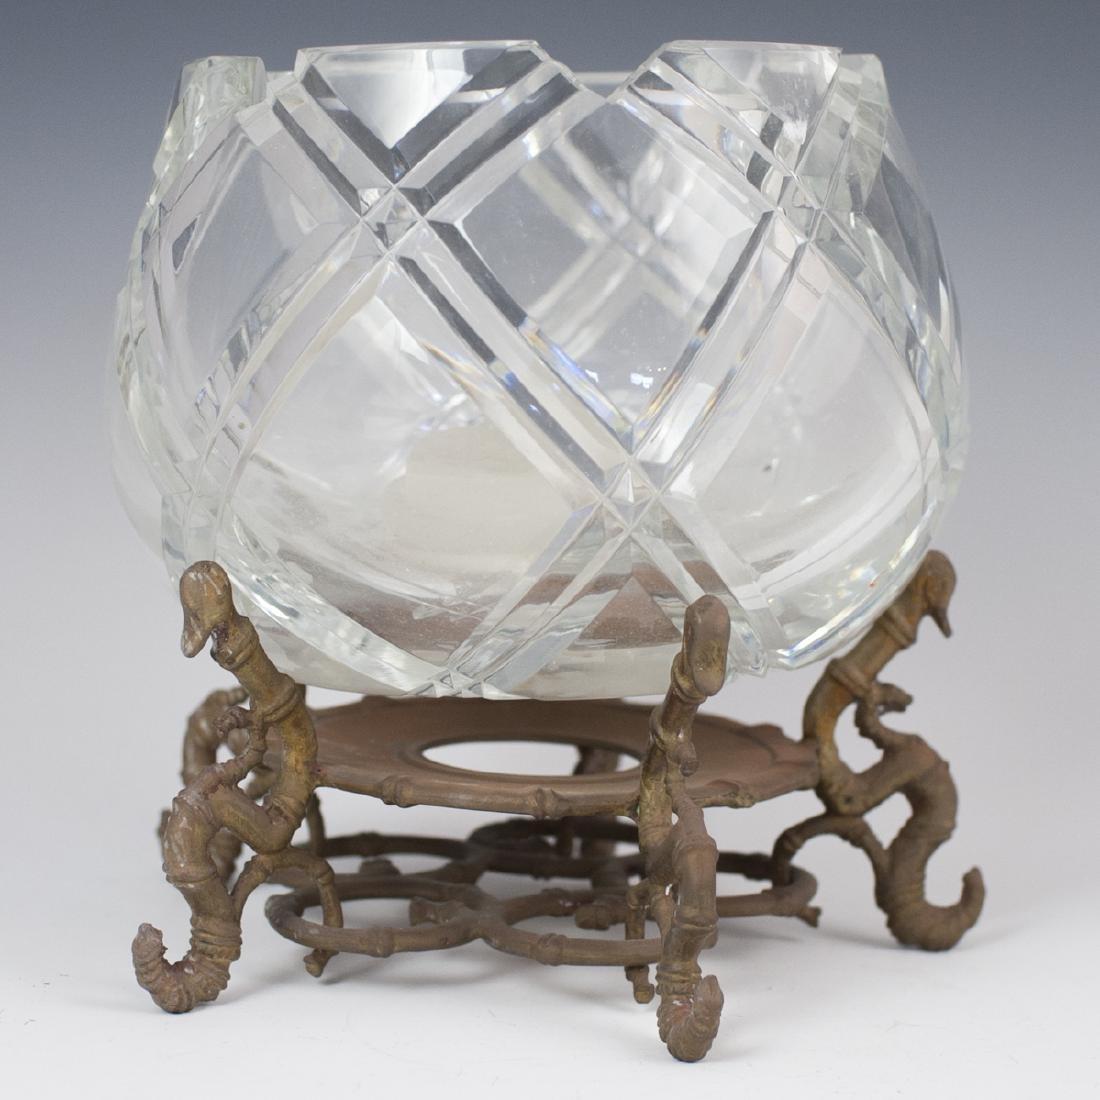 Orrefors Crystal Candle Globe